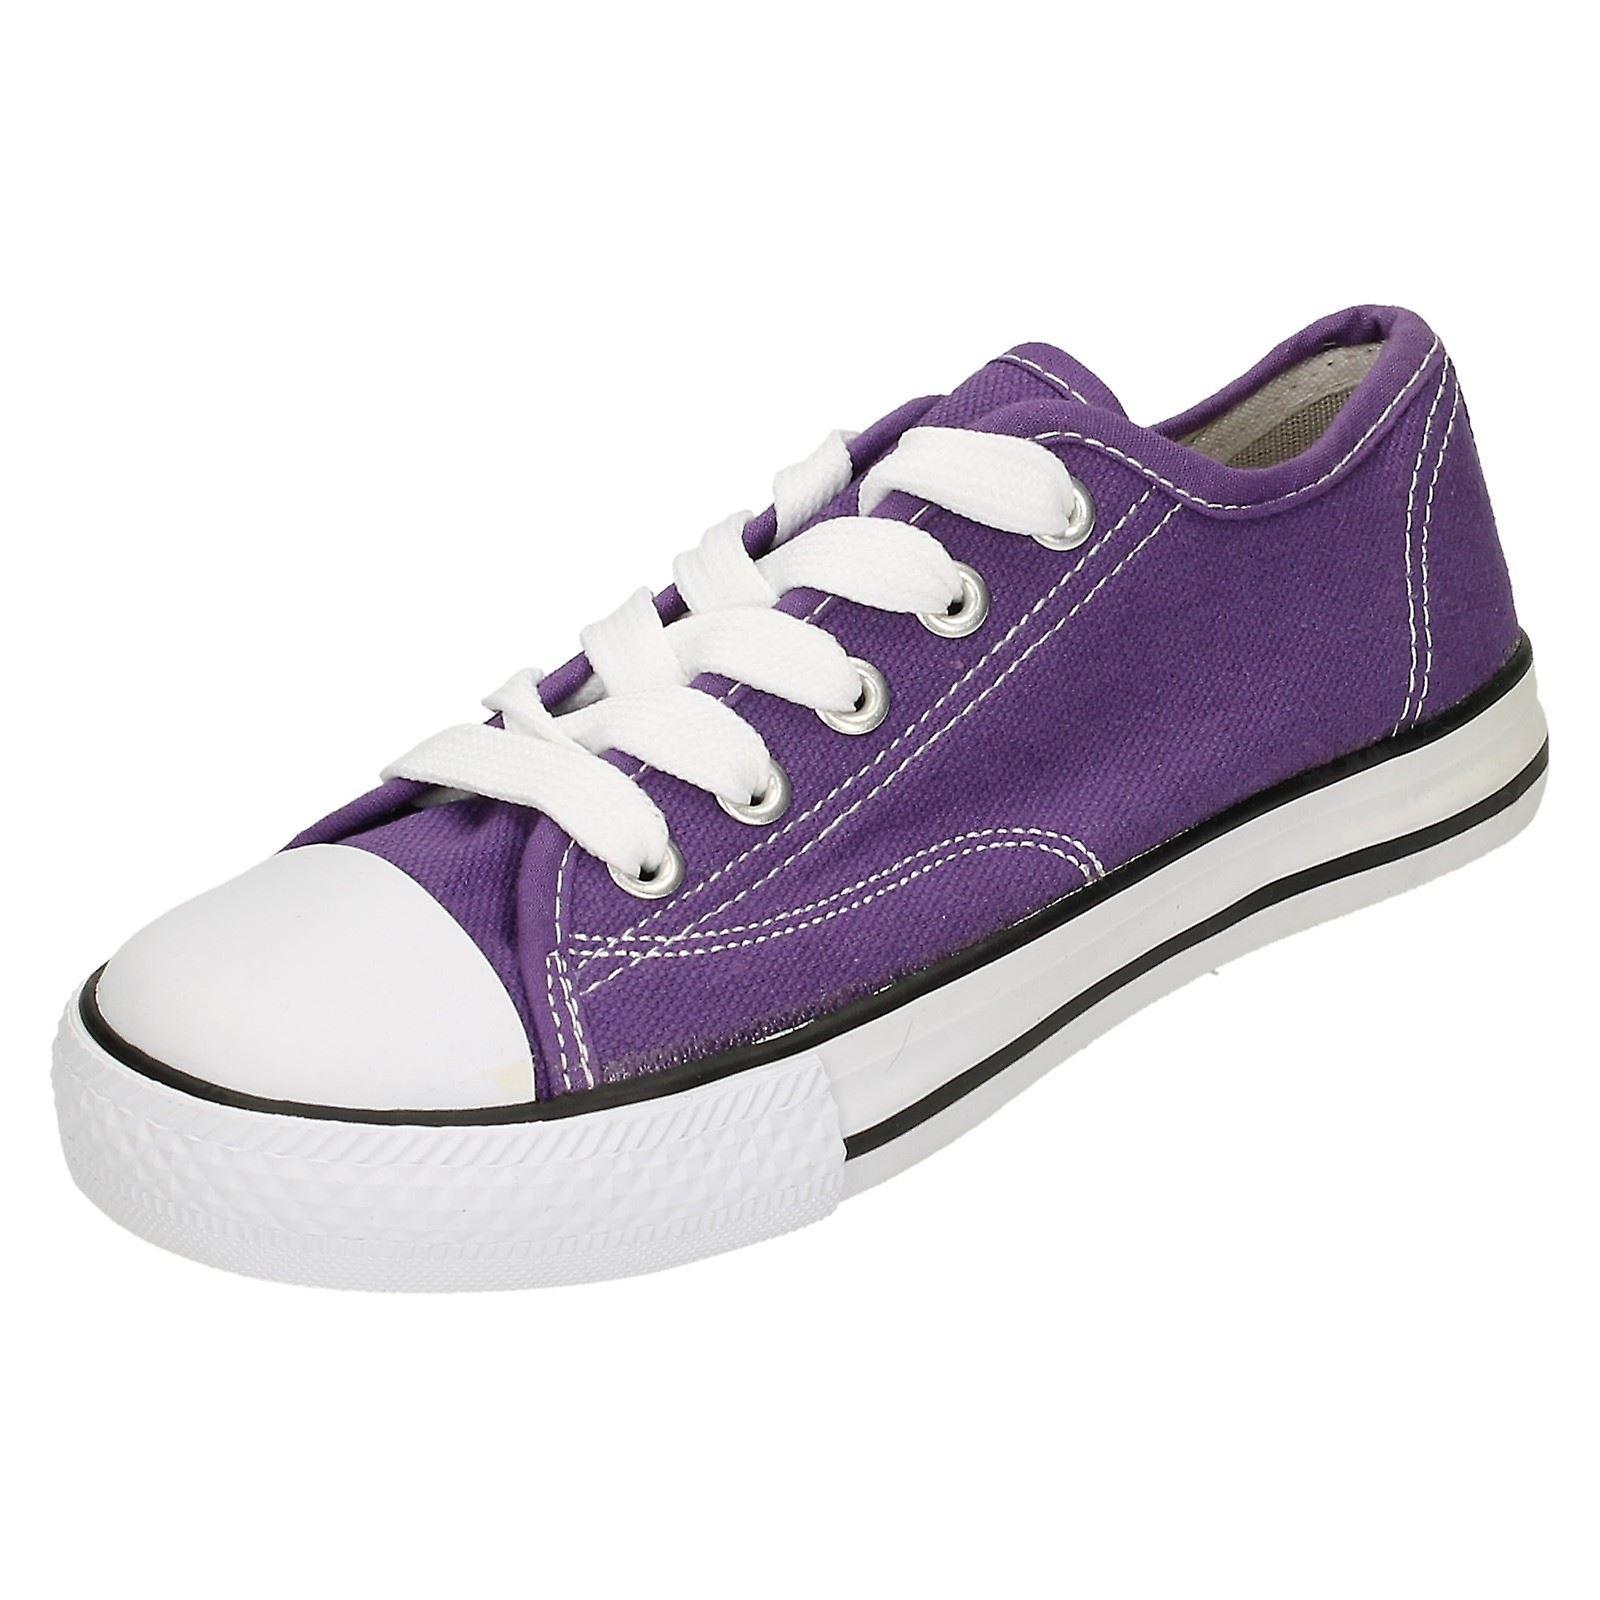 Womens Fleck auf Leinwand Lace Schuhe X0001